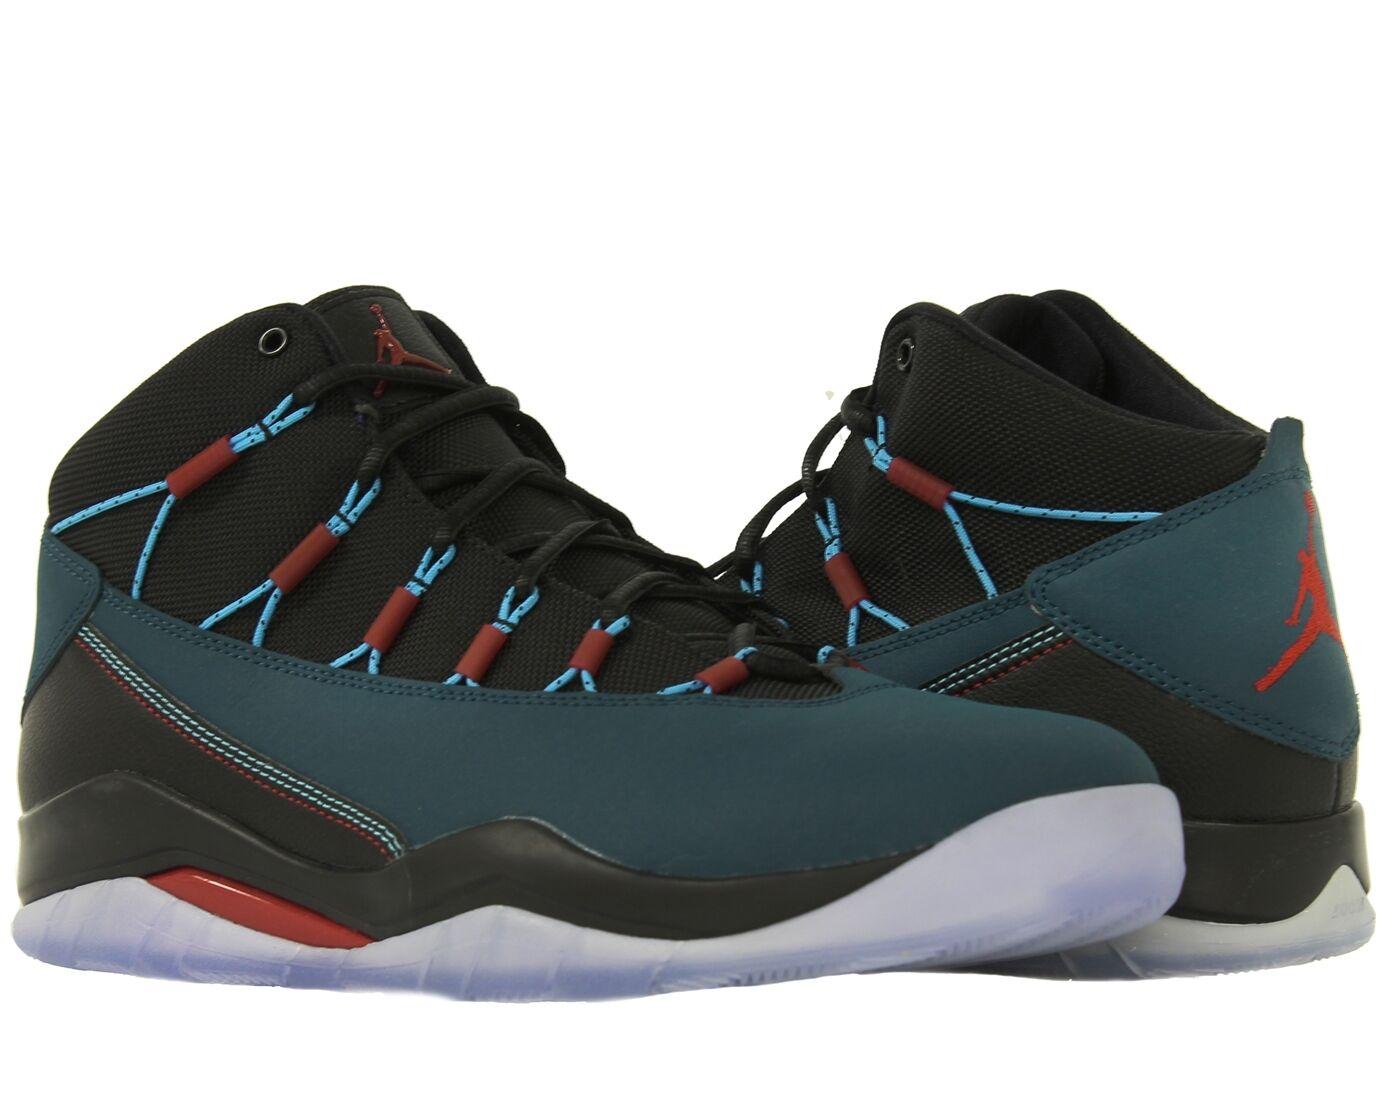 Men's Jordan Prime Flight Basketball Shoes Size 11, 616846 307 SEA/Blk/RD